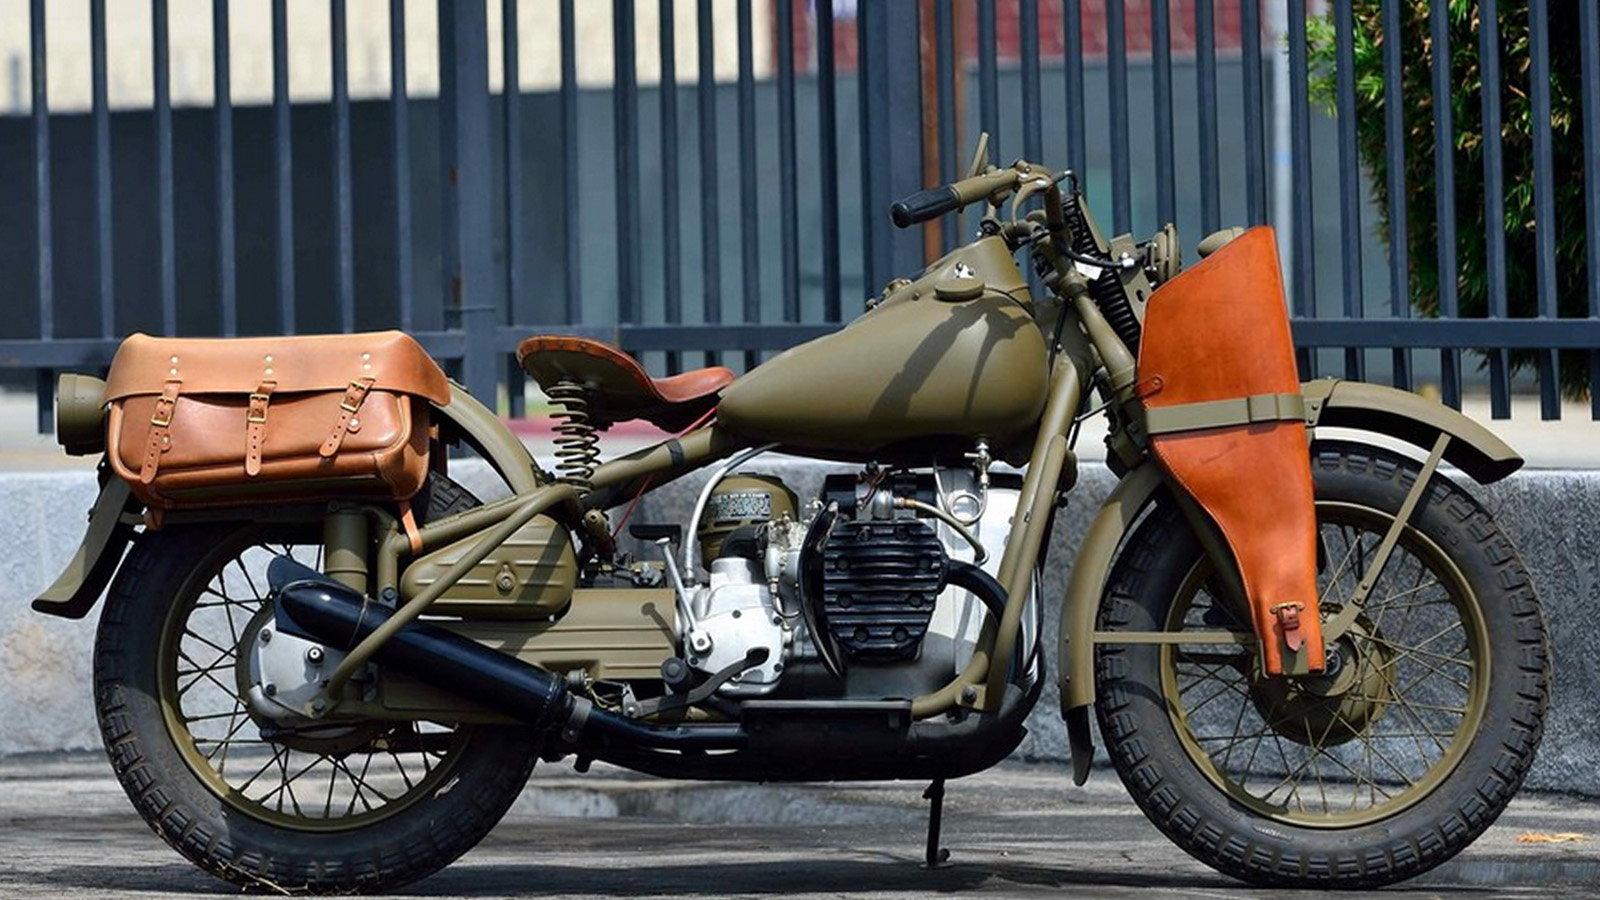 1942 XA Type 1 is the Rarest WW2 Harley-Davidson | Hdforums